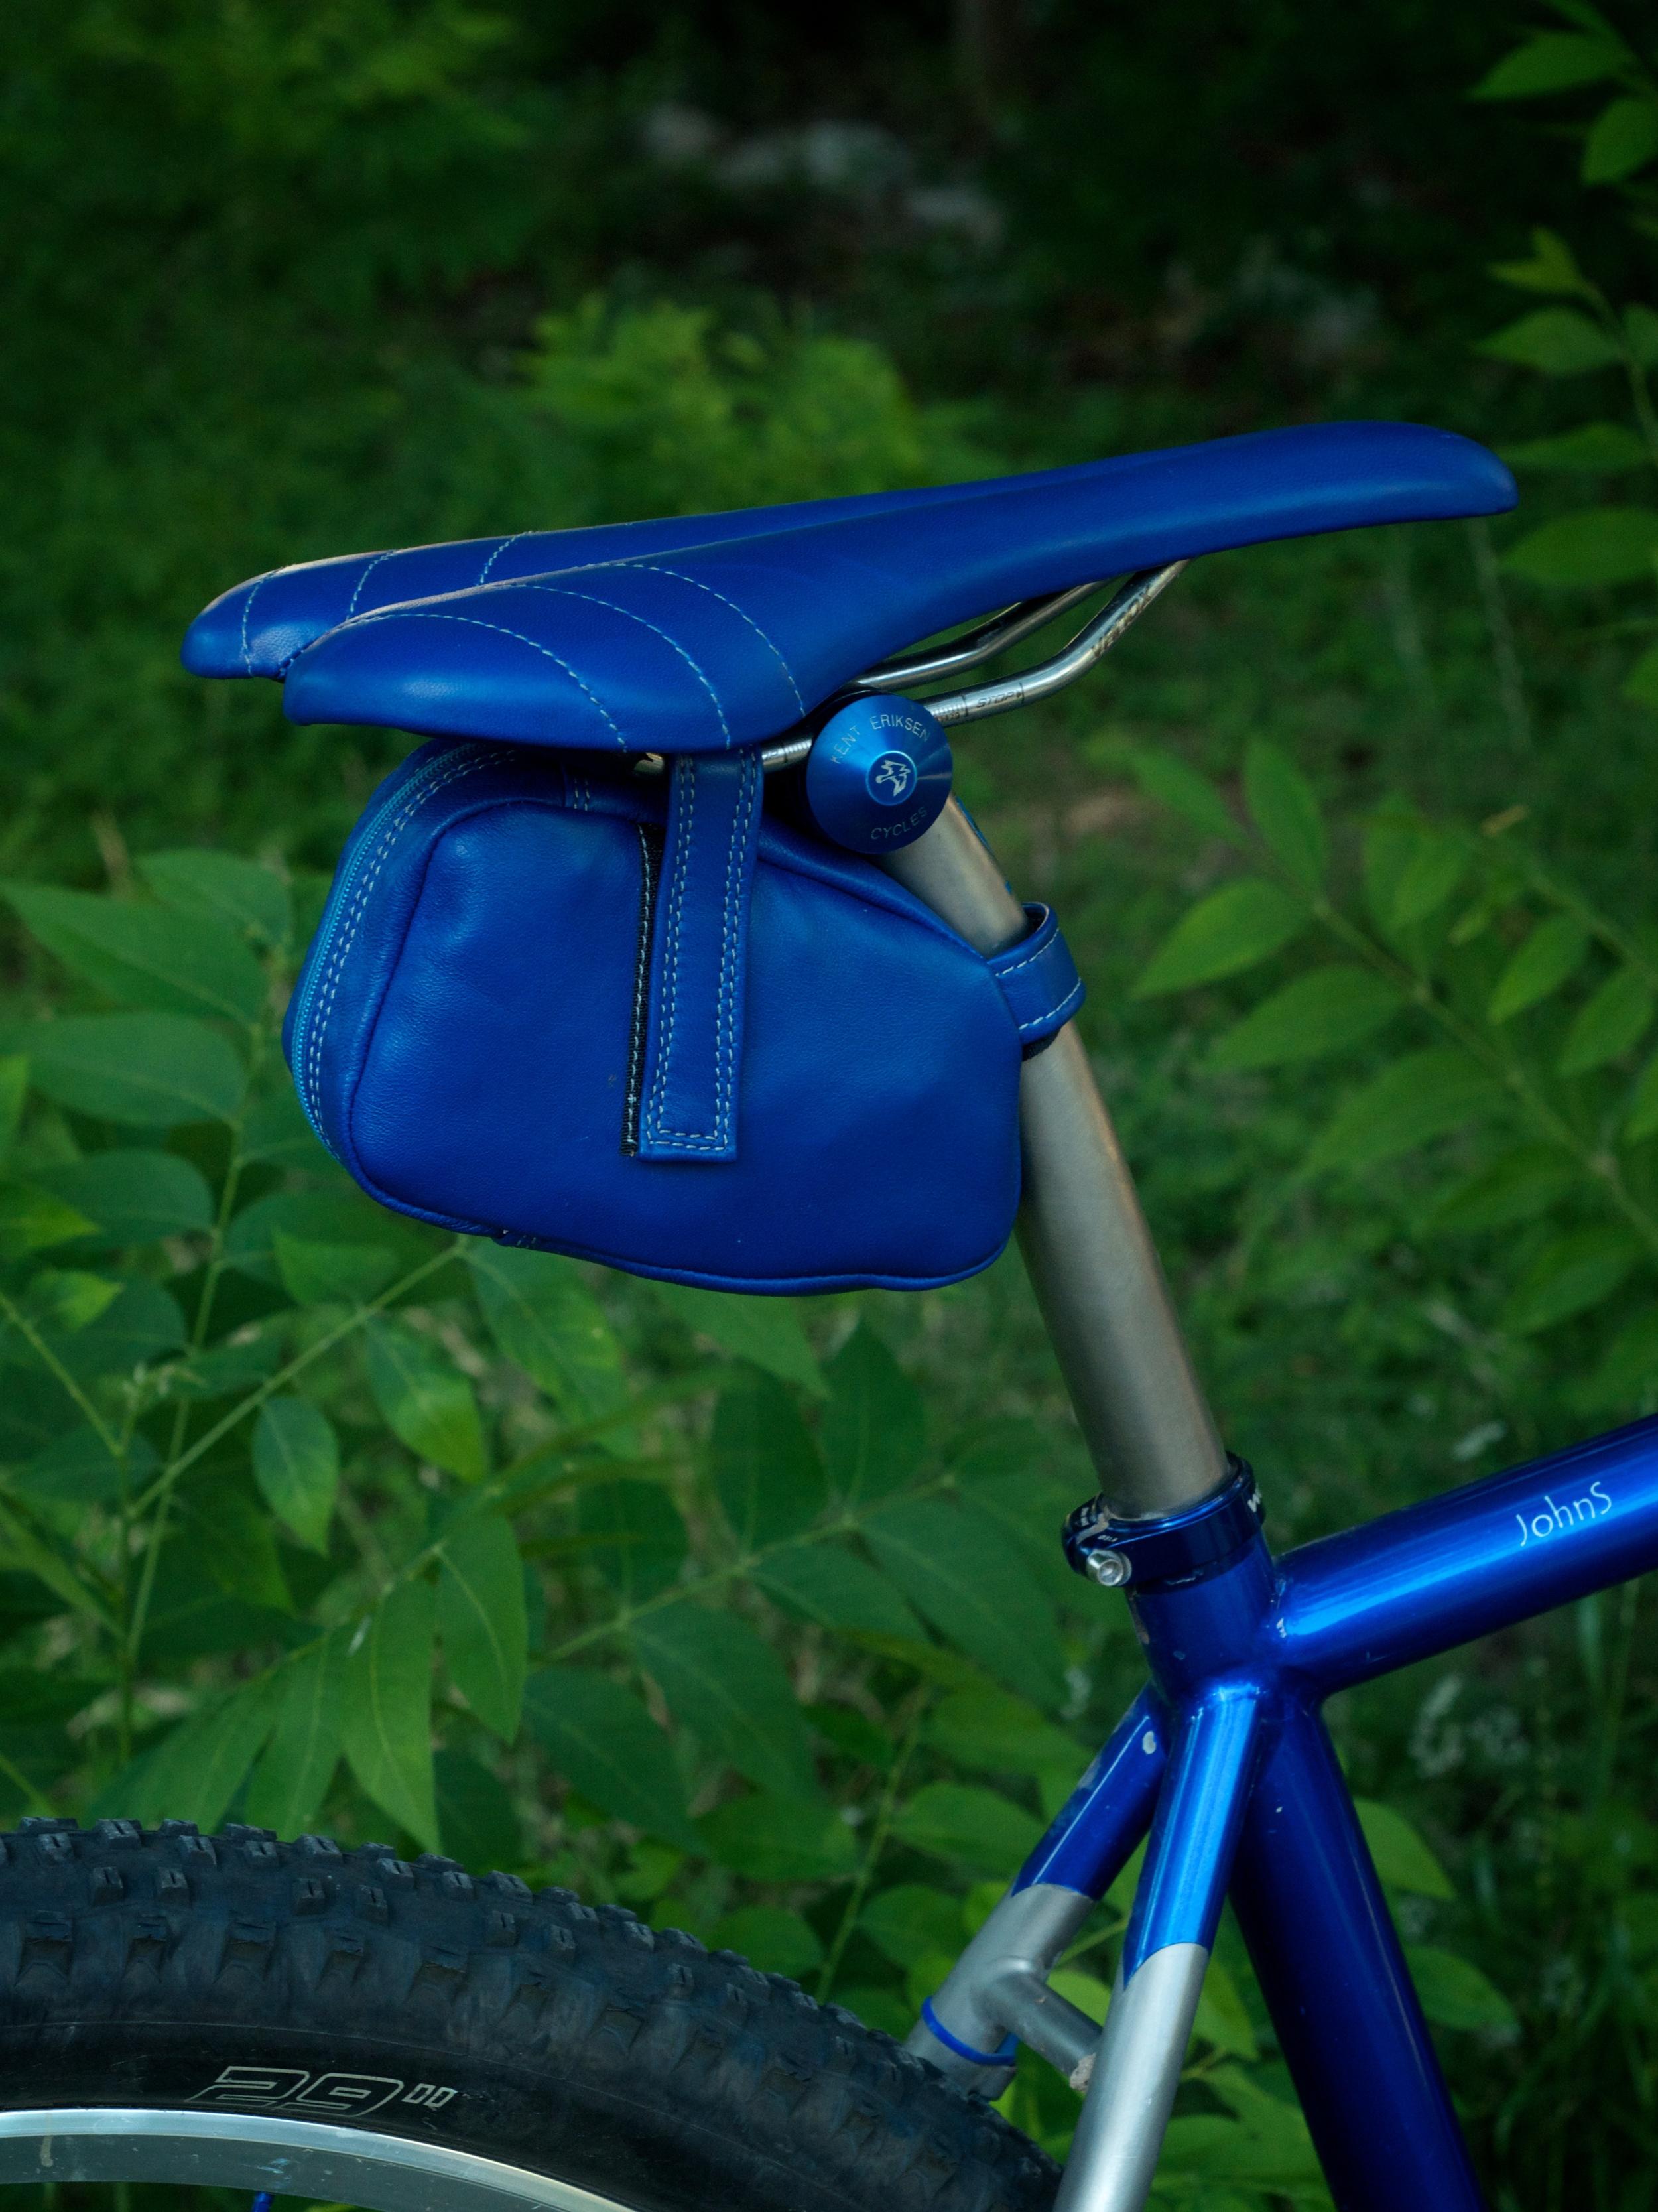 Custom-blue-leather-Selle_Italia-SLK-recover-repair-saddle-bag-handmade-Austin-texas-Willits-eriksen-vintage-brooks-busyman-grey-seat-vintage 6.jpg